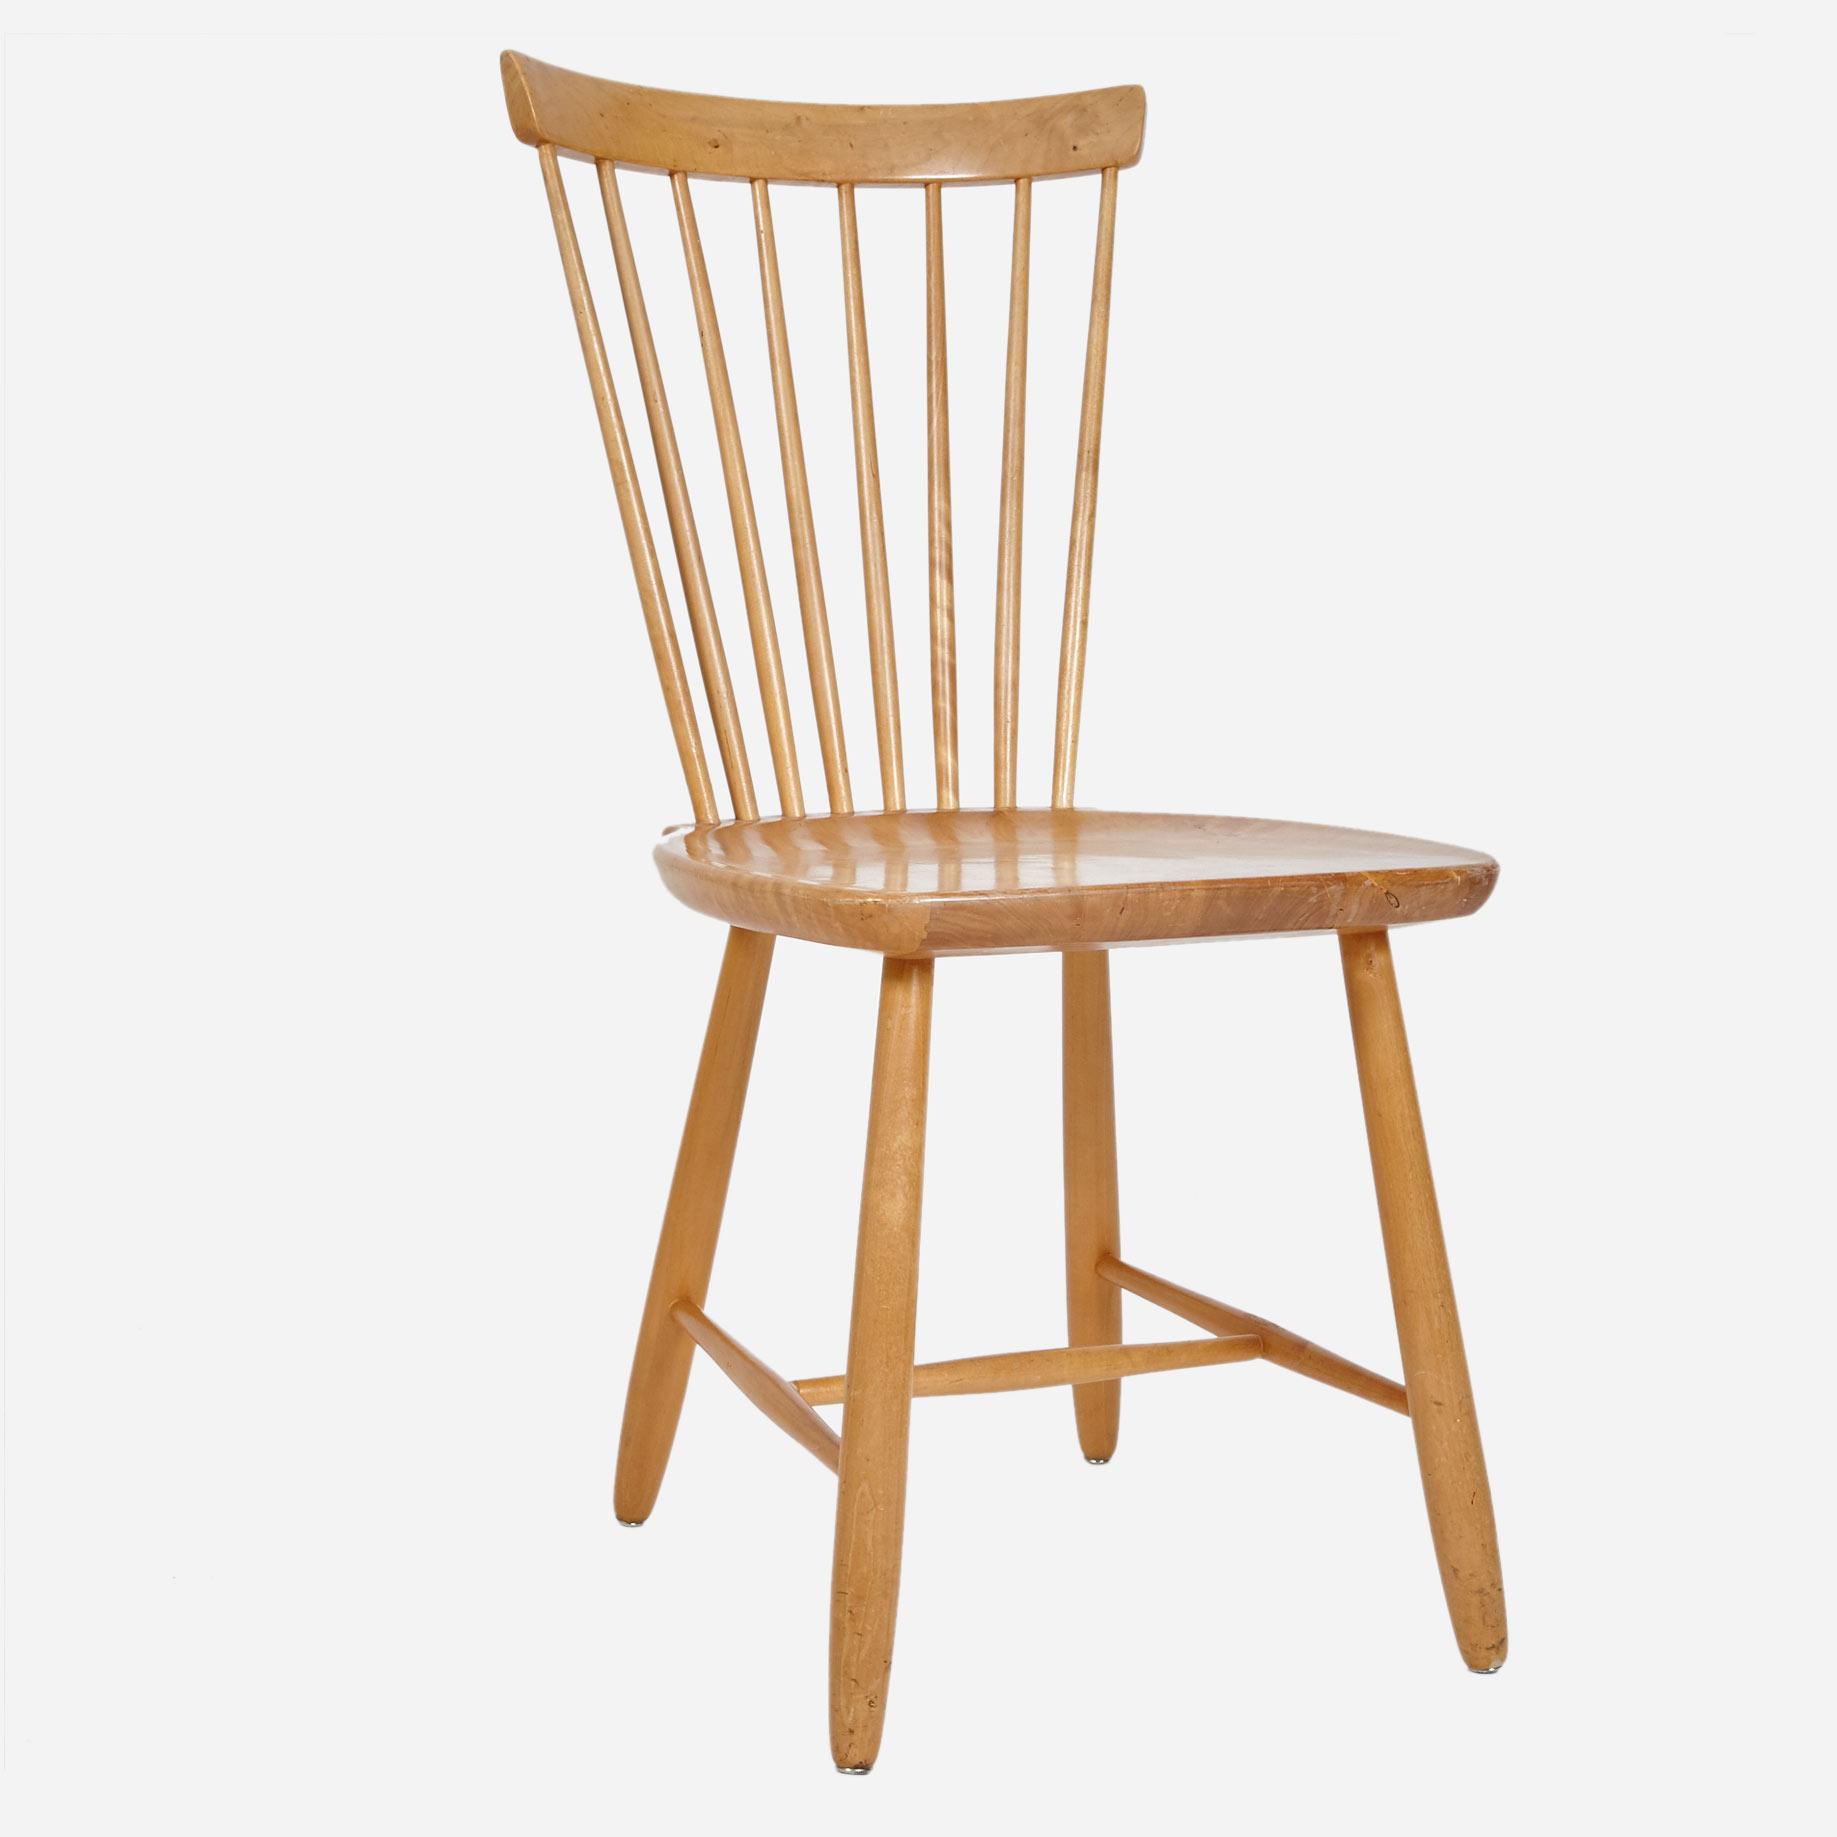 Stühle | Möbel Zürich | Vintagemöbel